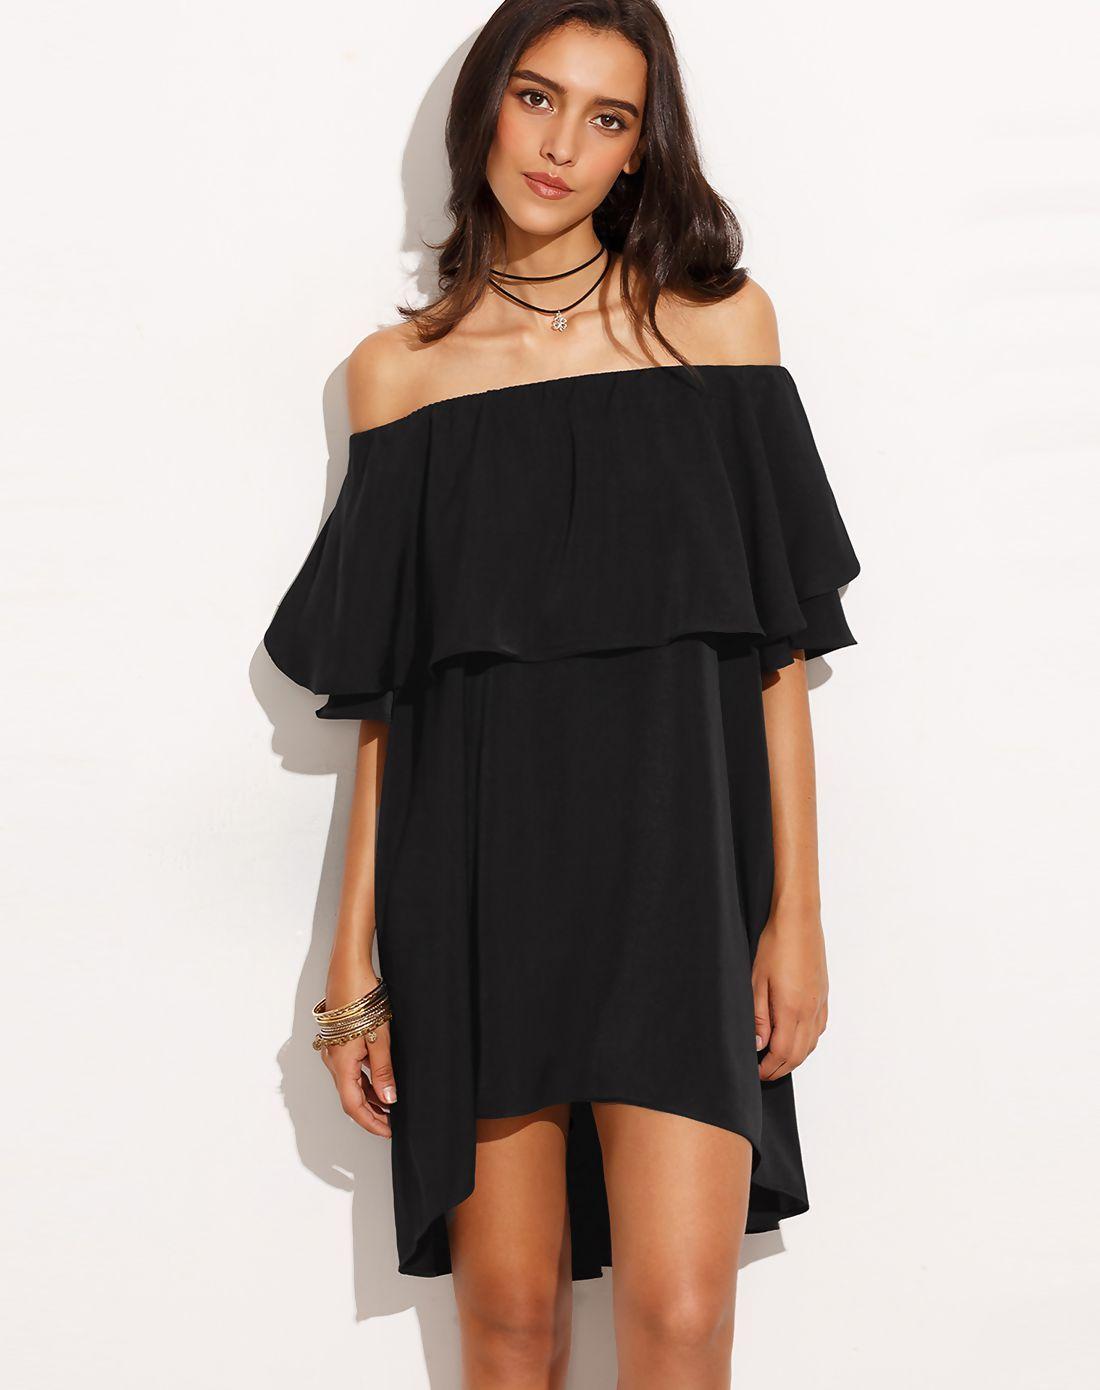 Adorewe vipme aline dressesdesigner akova black tulip boat